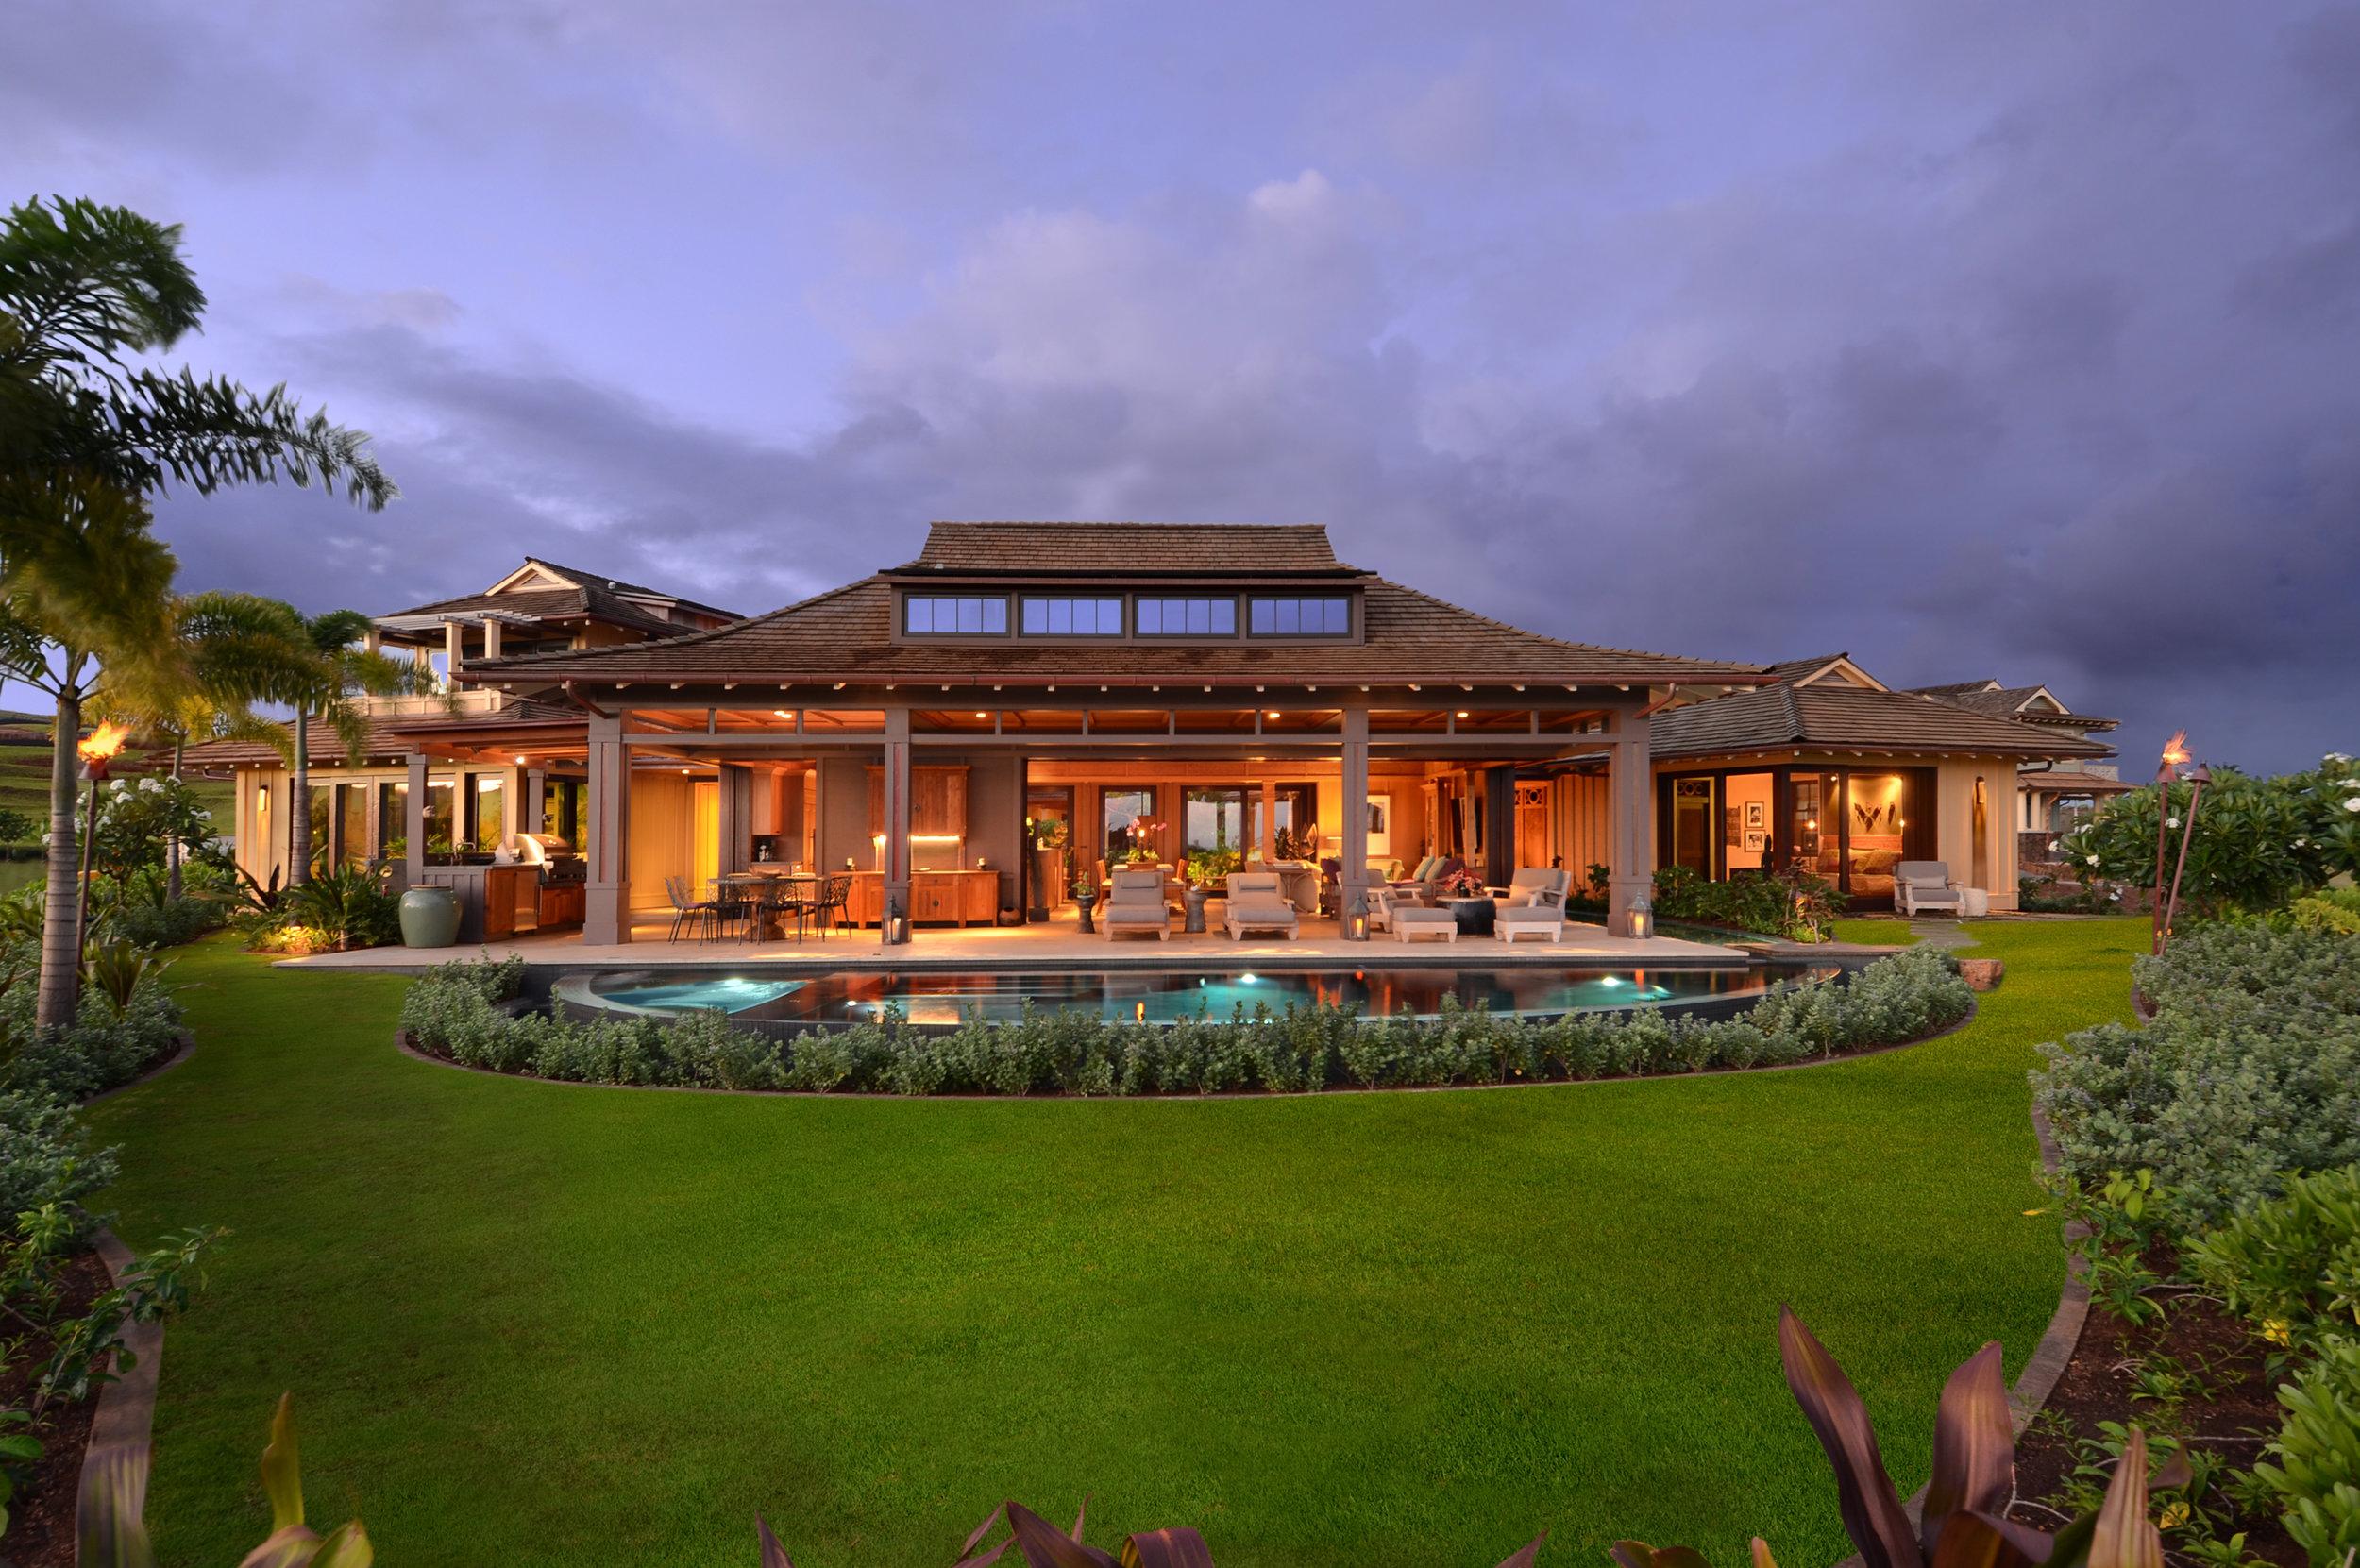 richmond_residence_exterior1.jpg